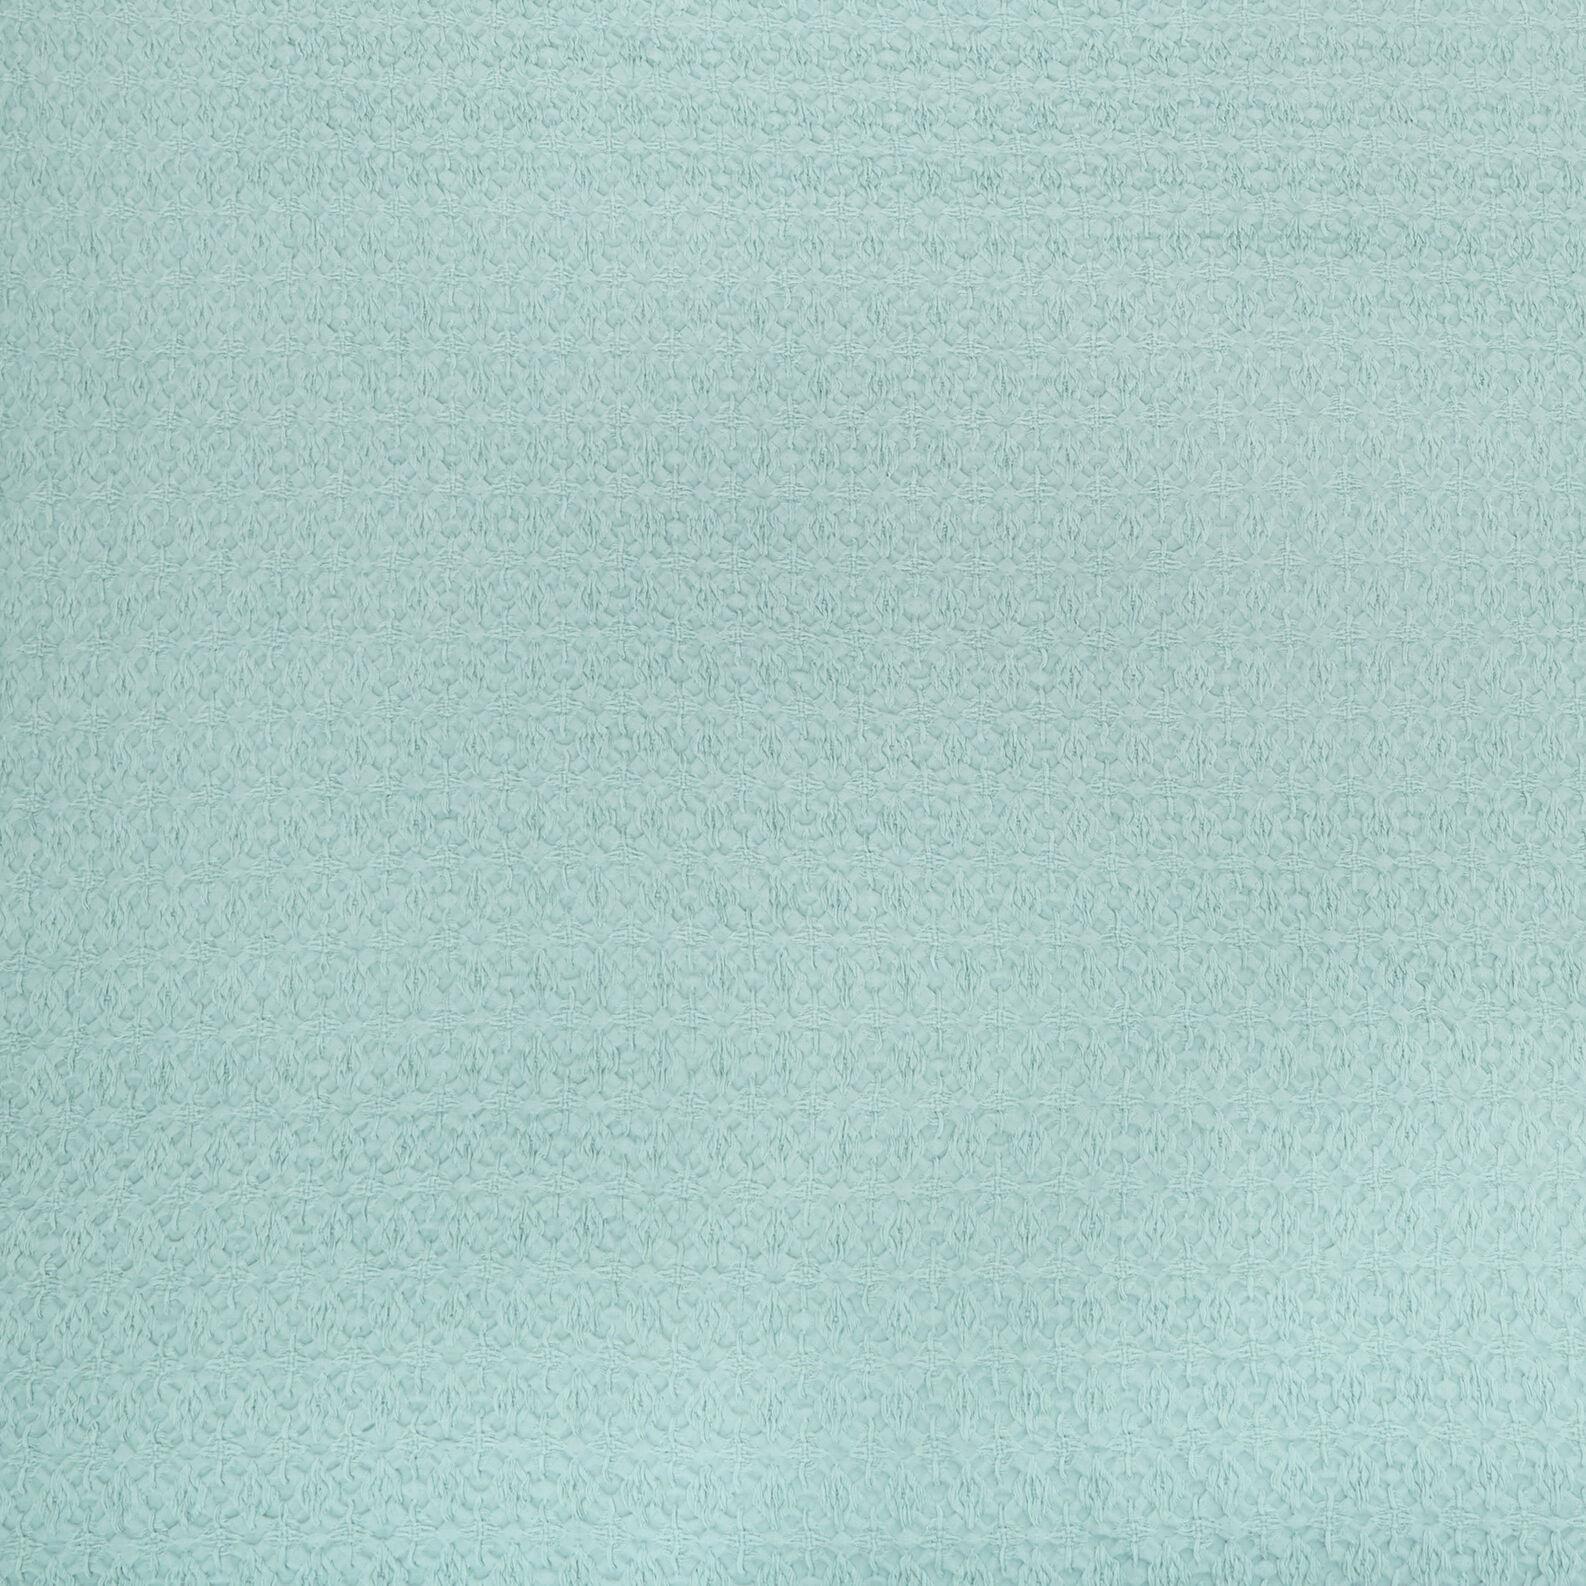 Embossed 100% cotton plaid